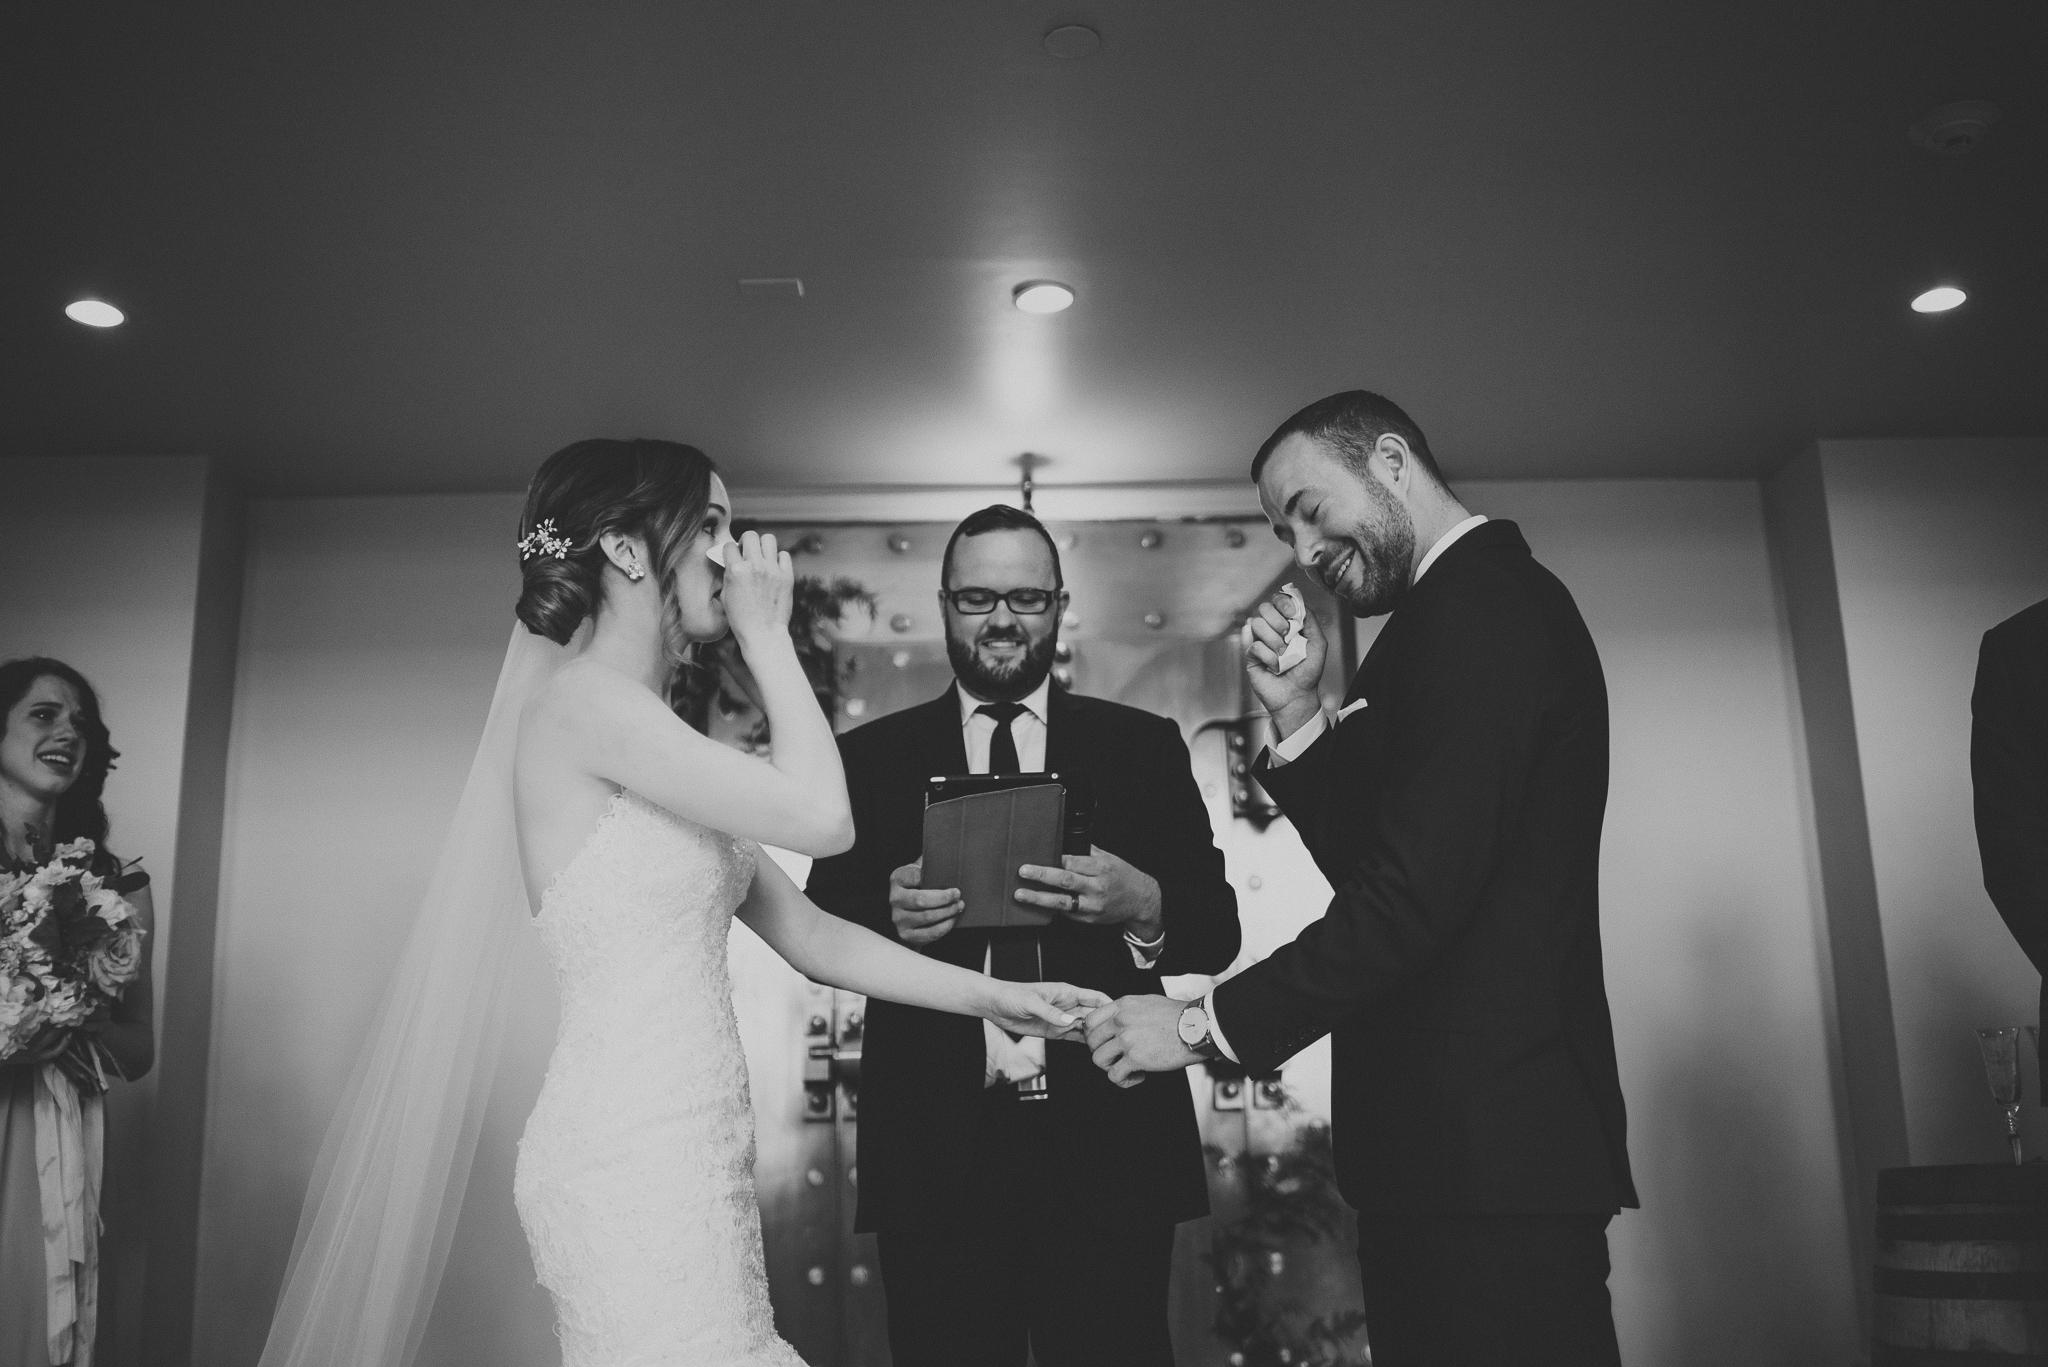 165-permanent-vancouver-wedding-courtneysteven-web-7889.jpg